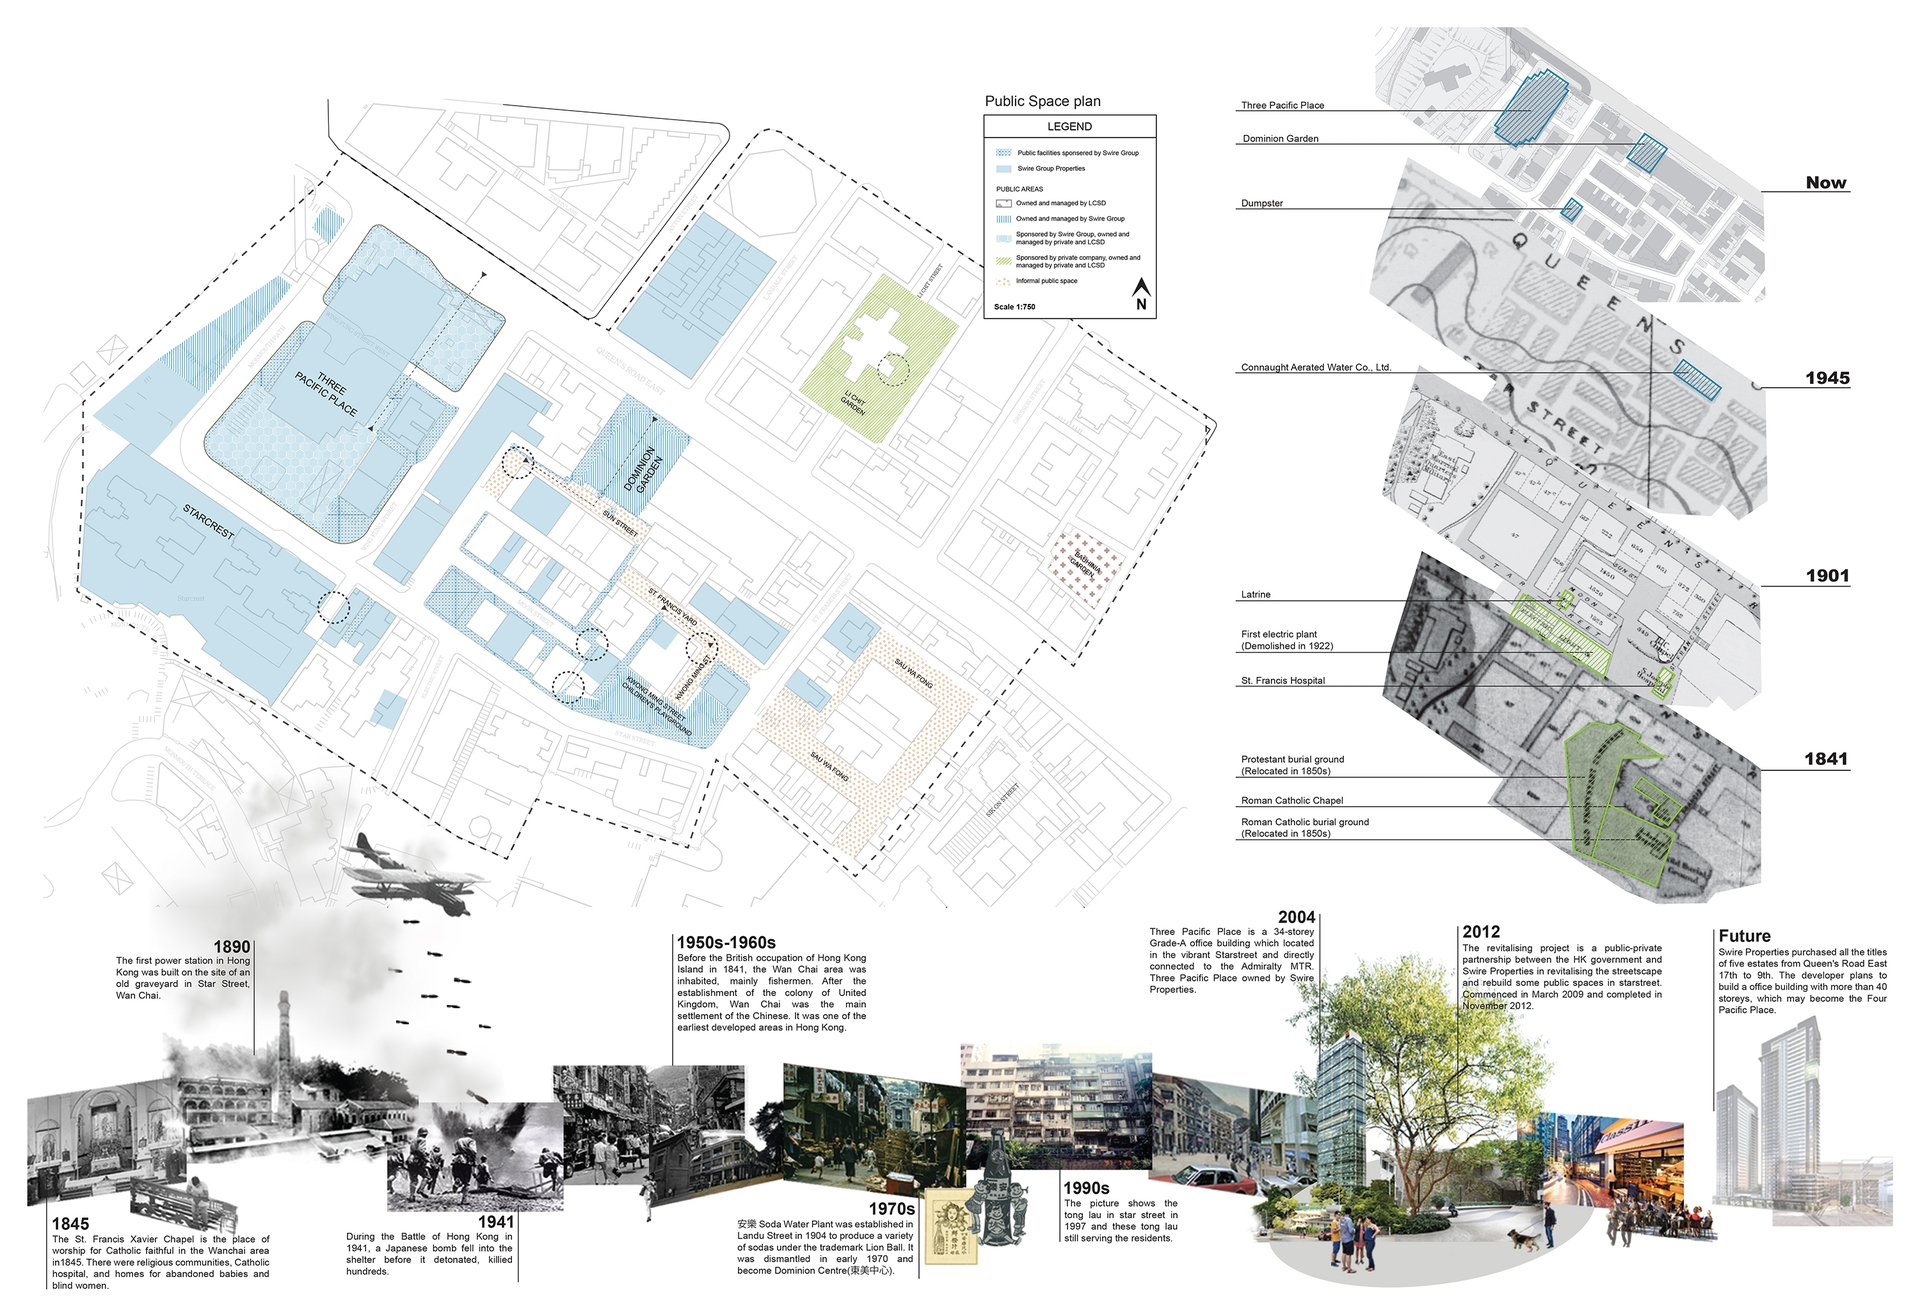 Enlarge Photo: Star Street Precinct. By LO Nga Yi; PANG Wai King; and WONG Sze Lee.